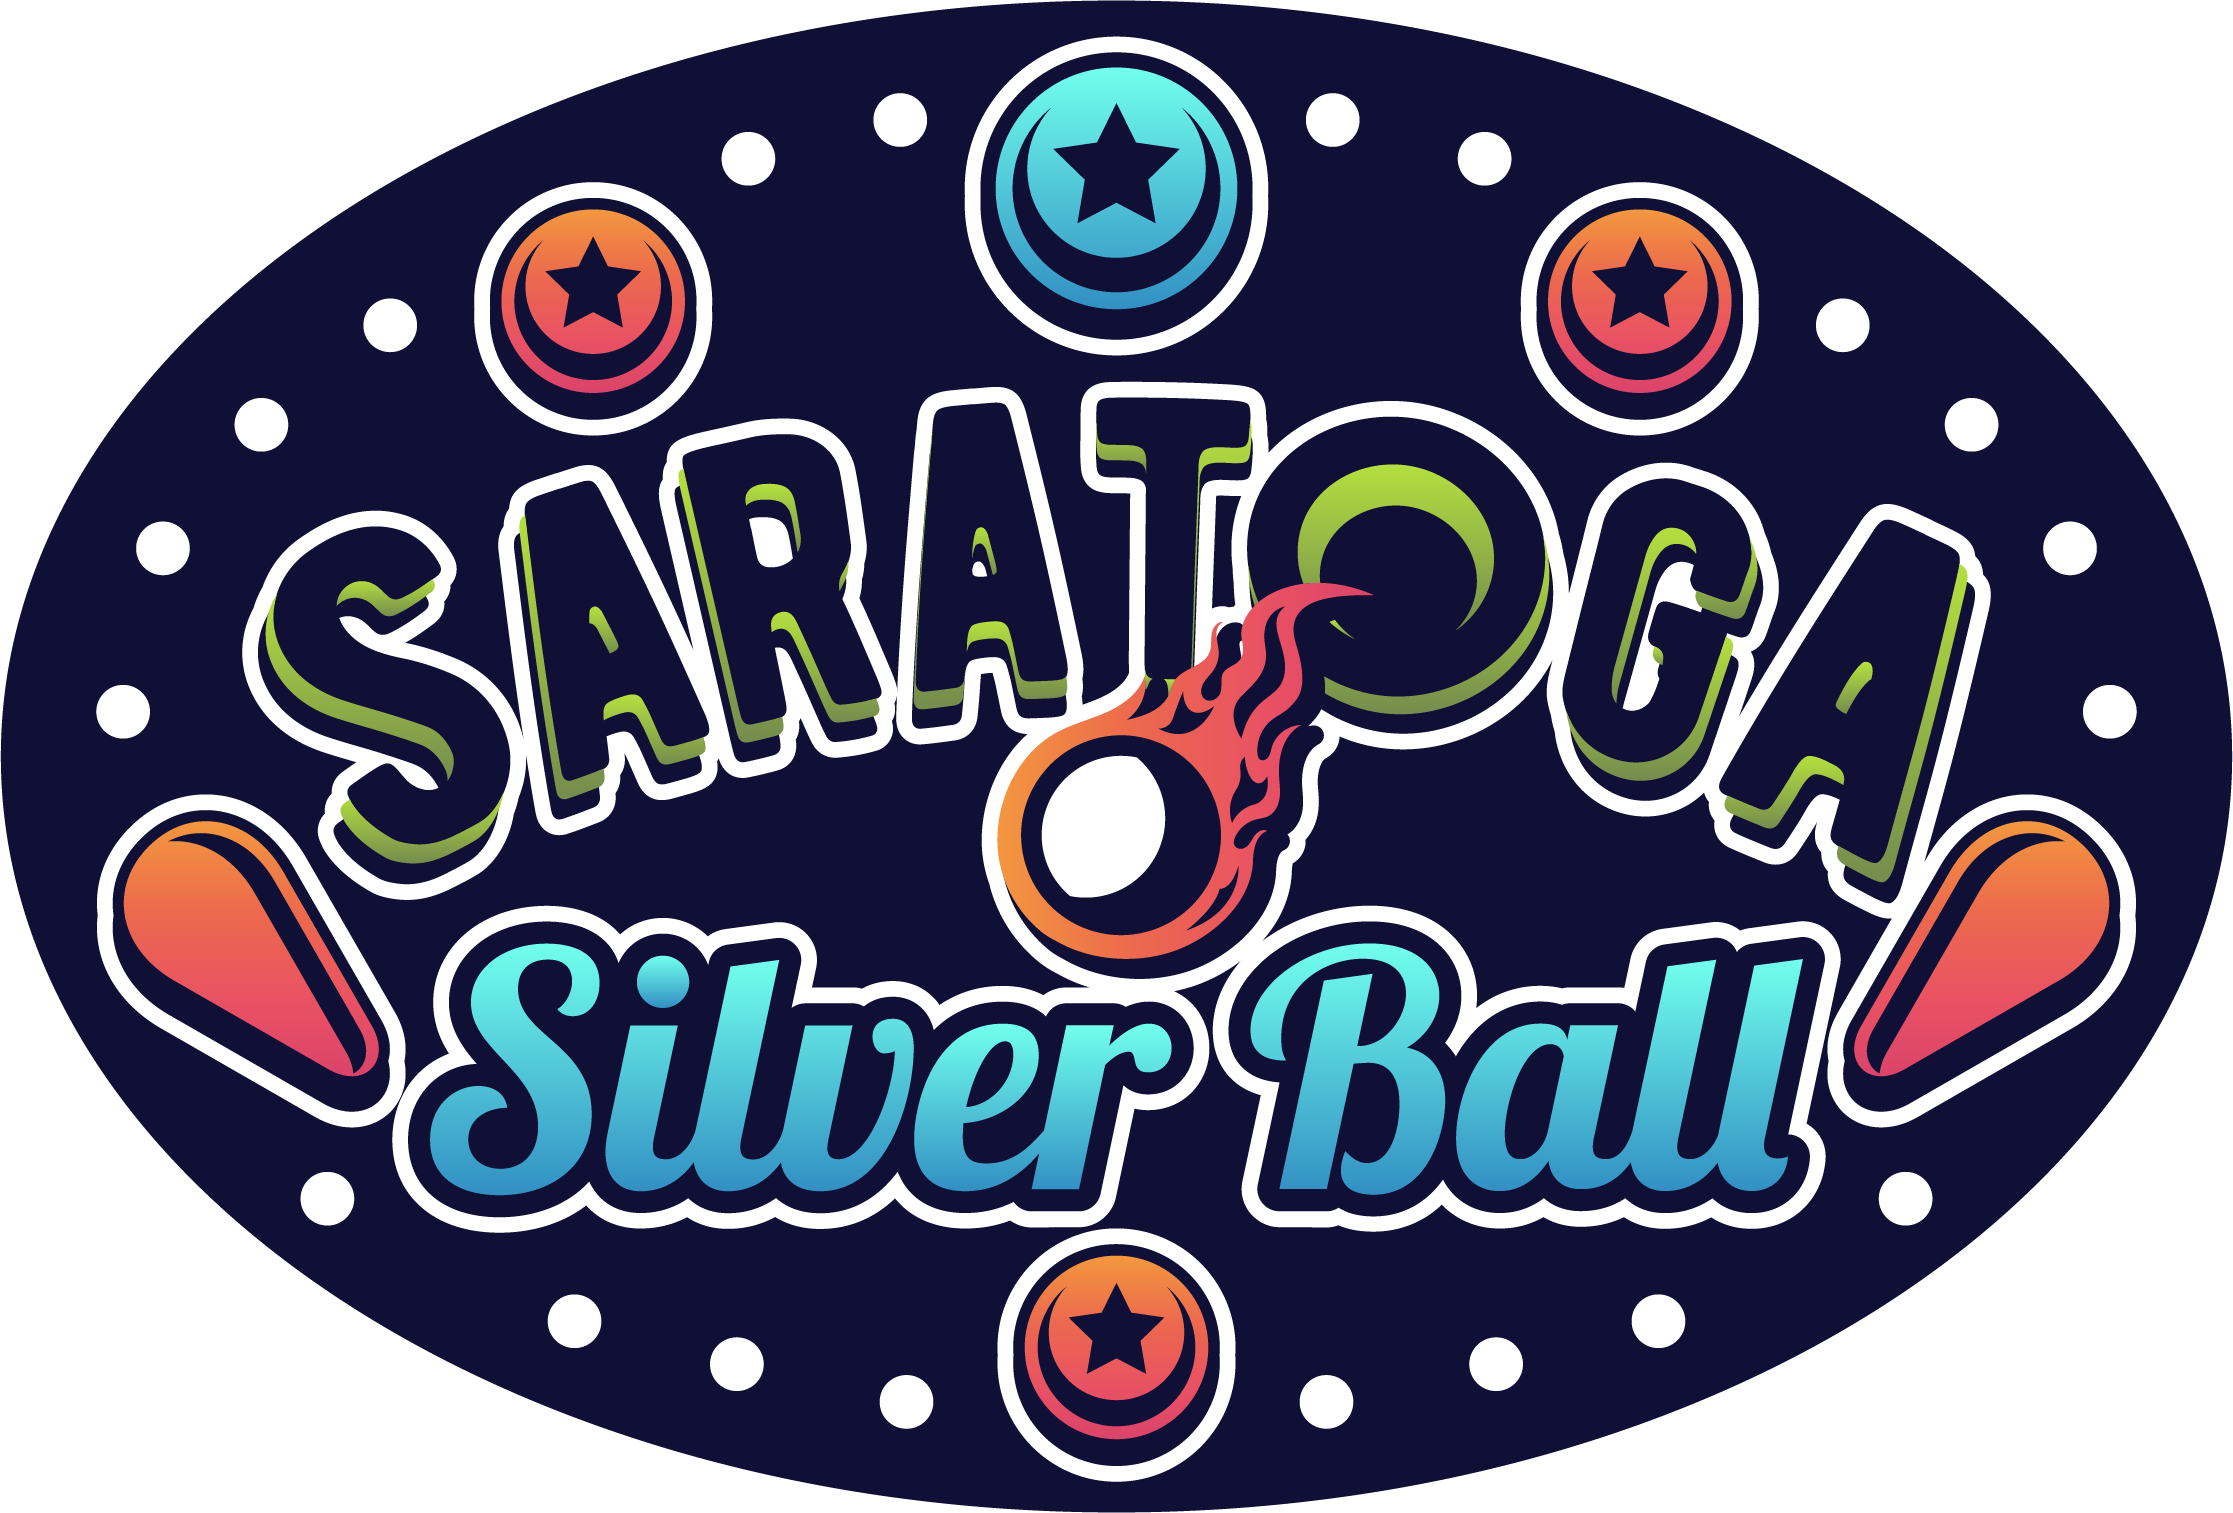 Saratoga Silverball Pinball Show